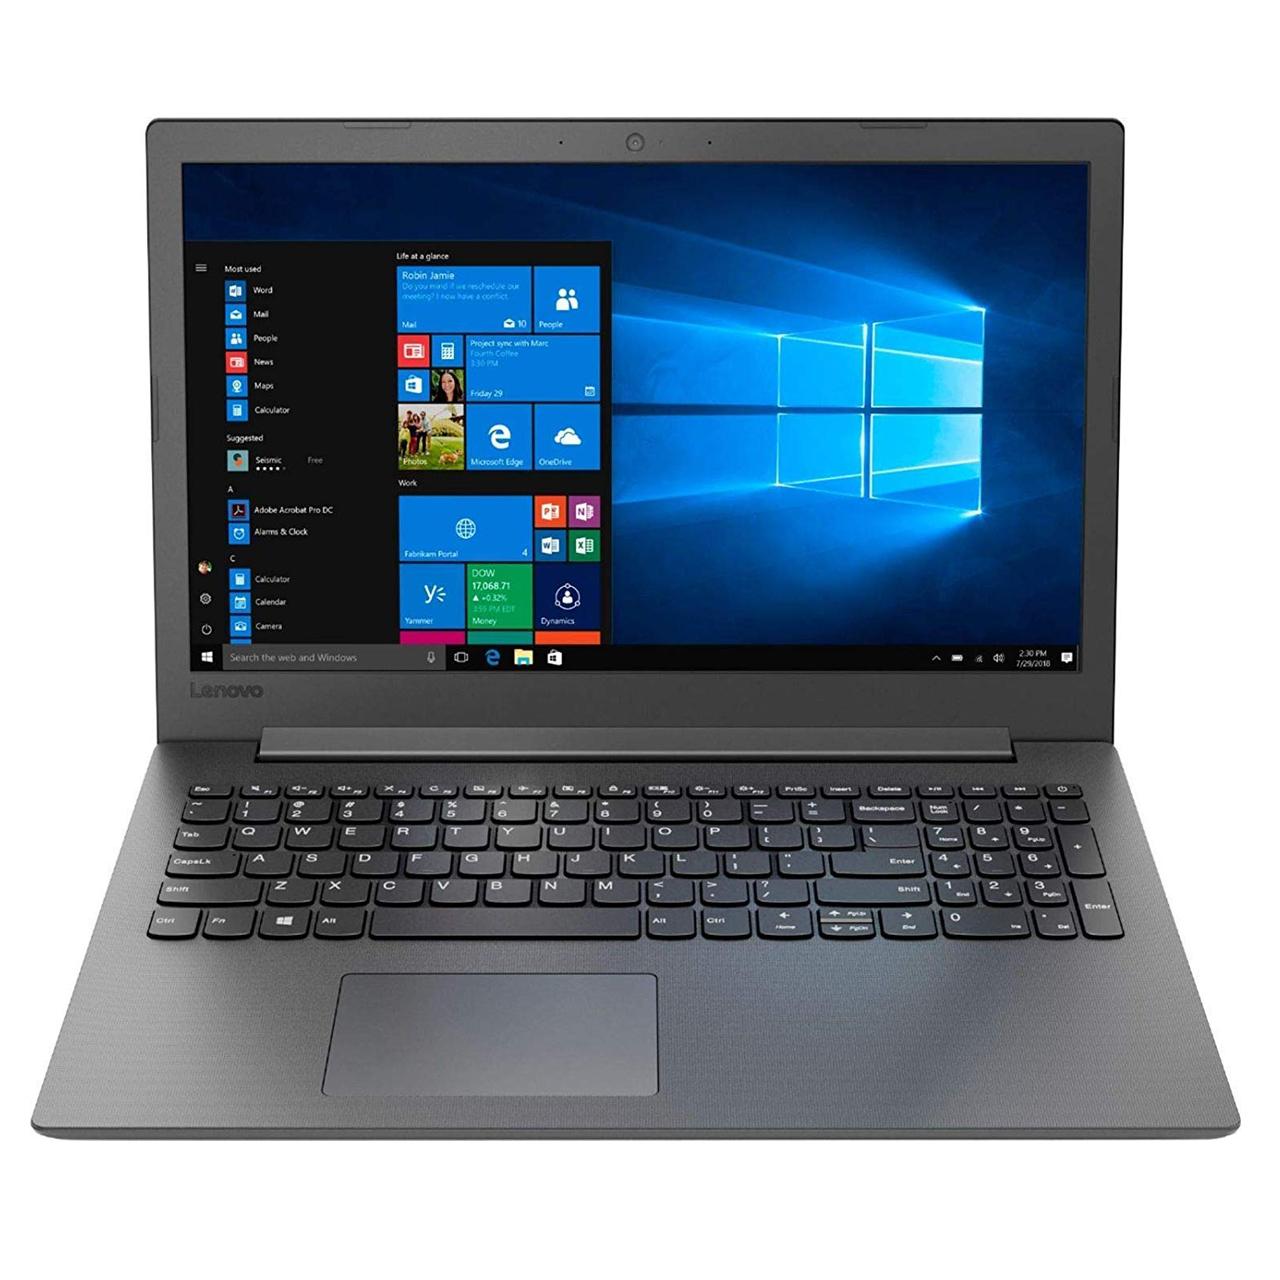 لپ تاپ 15 اینچی لنوو مدل Ideapad 130 - PPQ